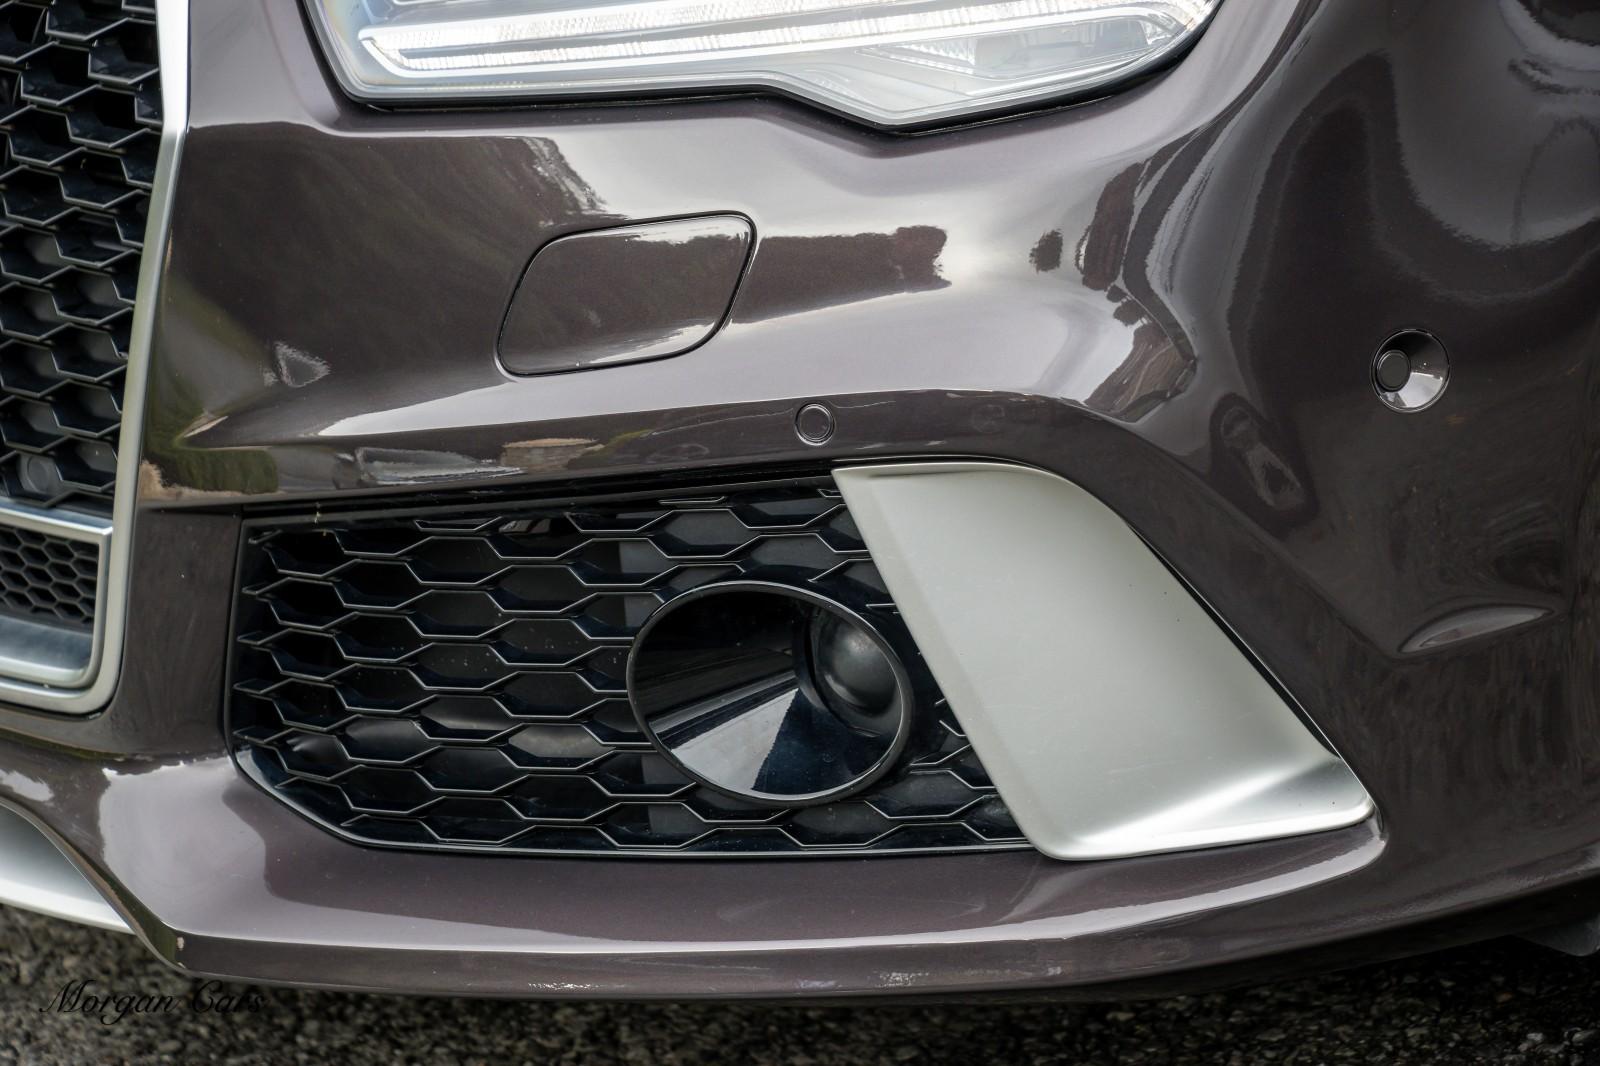 2015 Audi A7 RS7 SPORTBACK TFSI V8 QUATTRO Petrol Automatic – Morgan Cars 9 Mound Road, Warrenpoint, Newry BT34 3LW, UK full